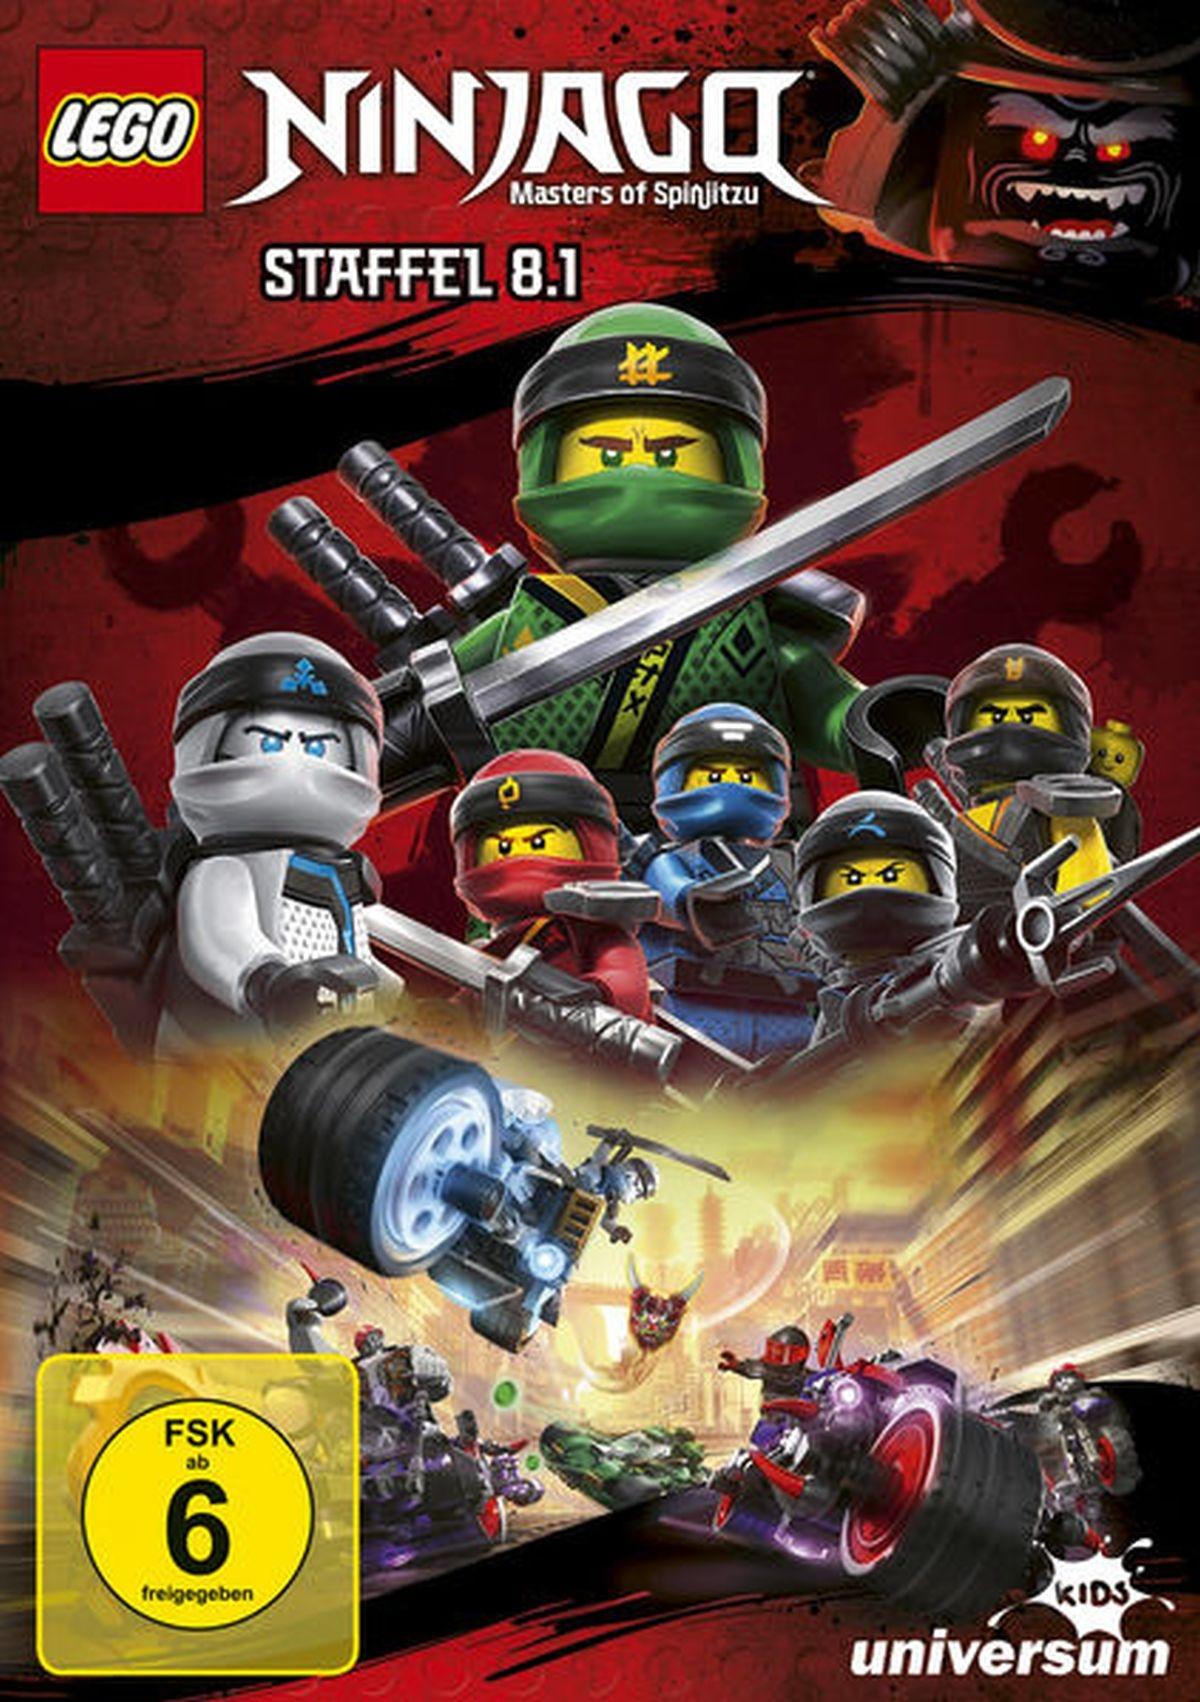 LEGO Ninjago - Staffel 8.1 (DVD)